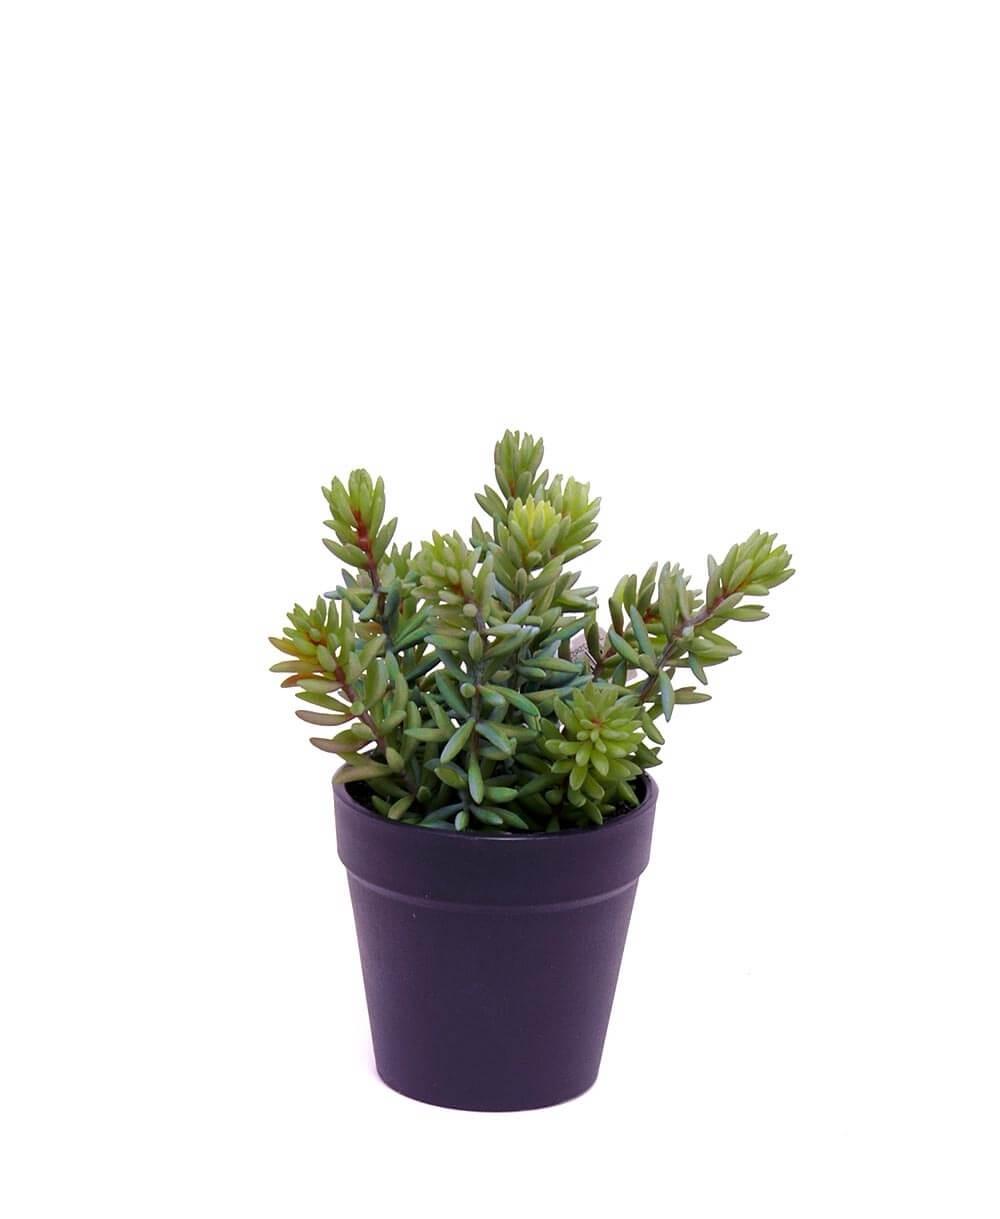 Succulent i kruka, konstgjord